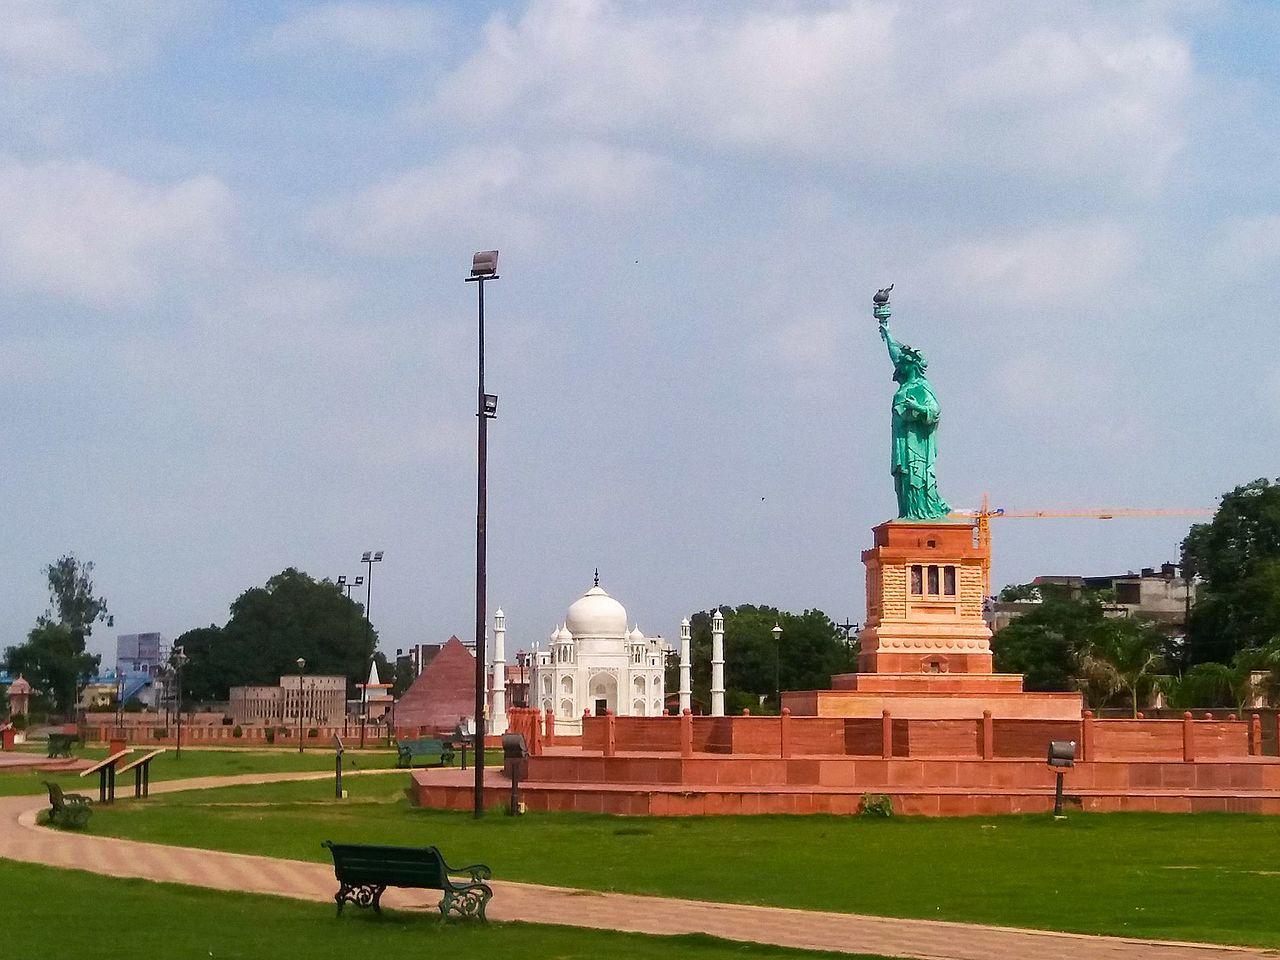 Popular Tourist Place to Visit in Kota, Rajasthan-Seven Wonders Park